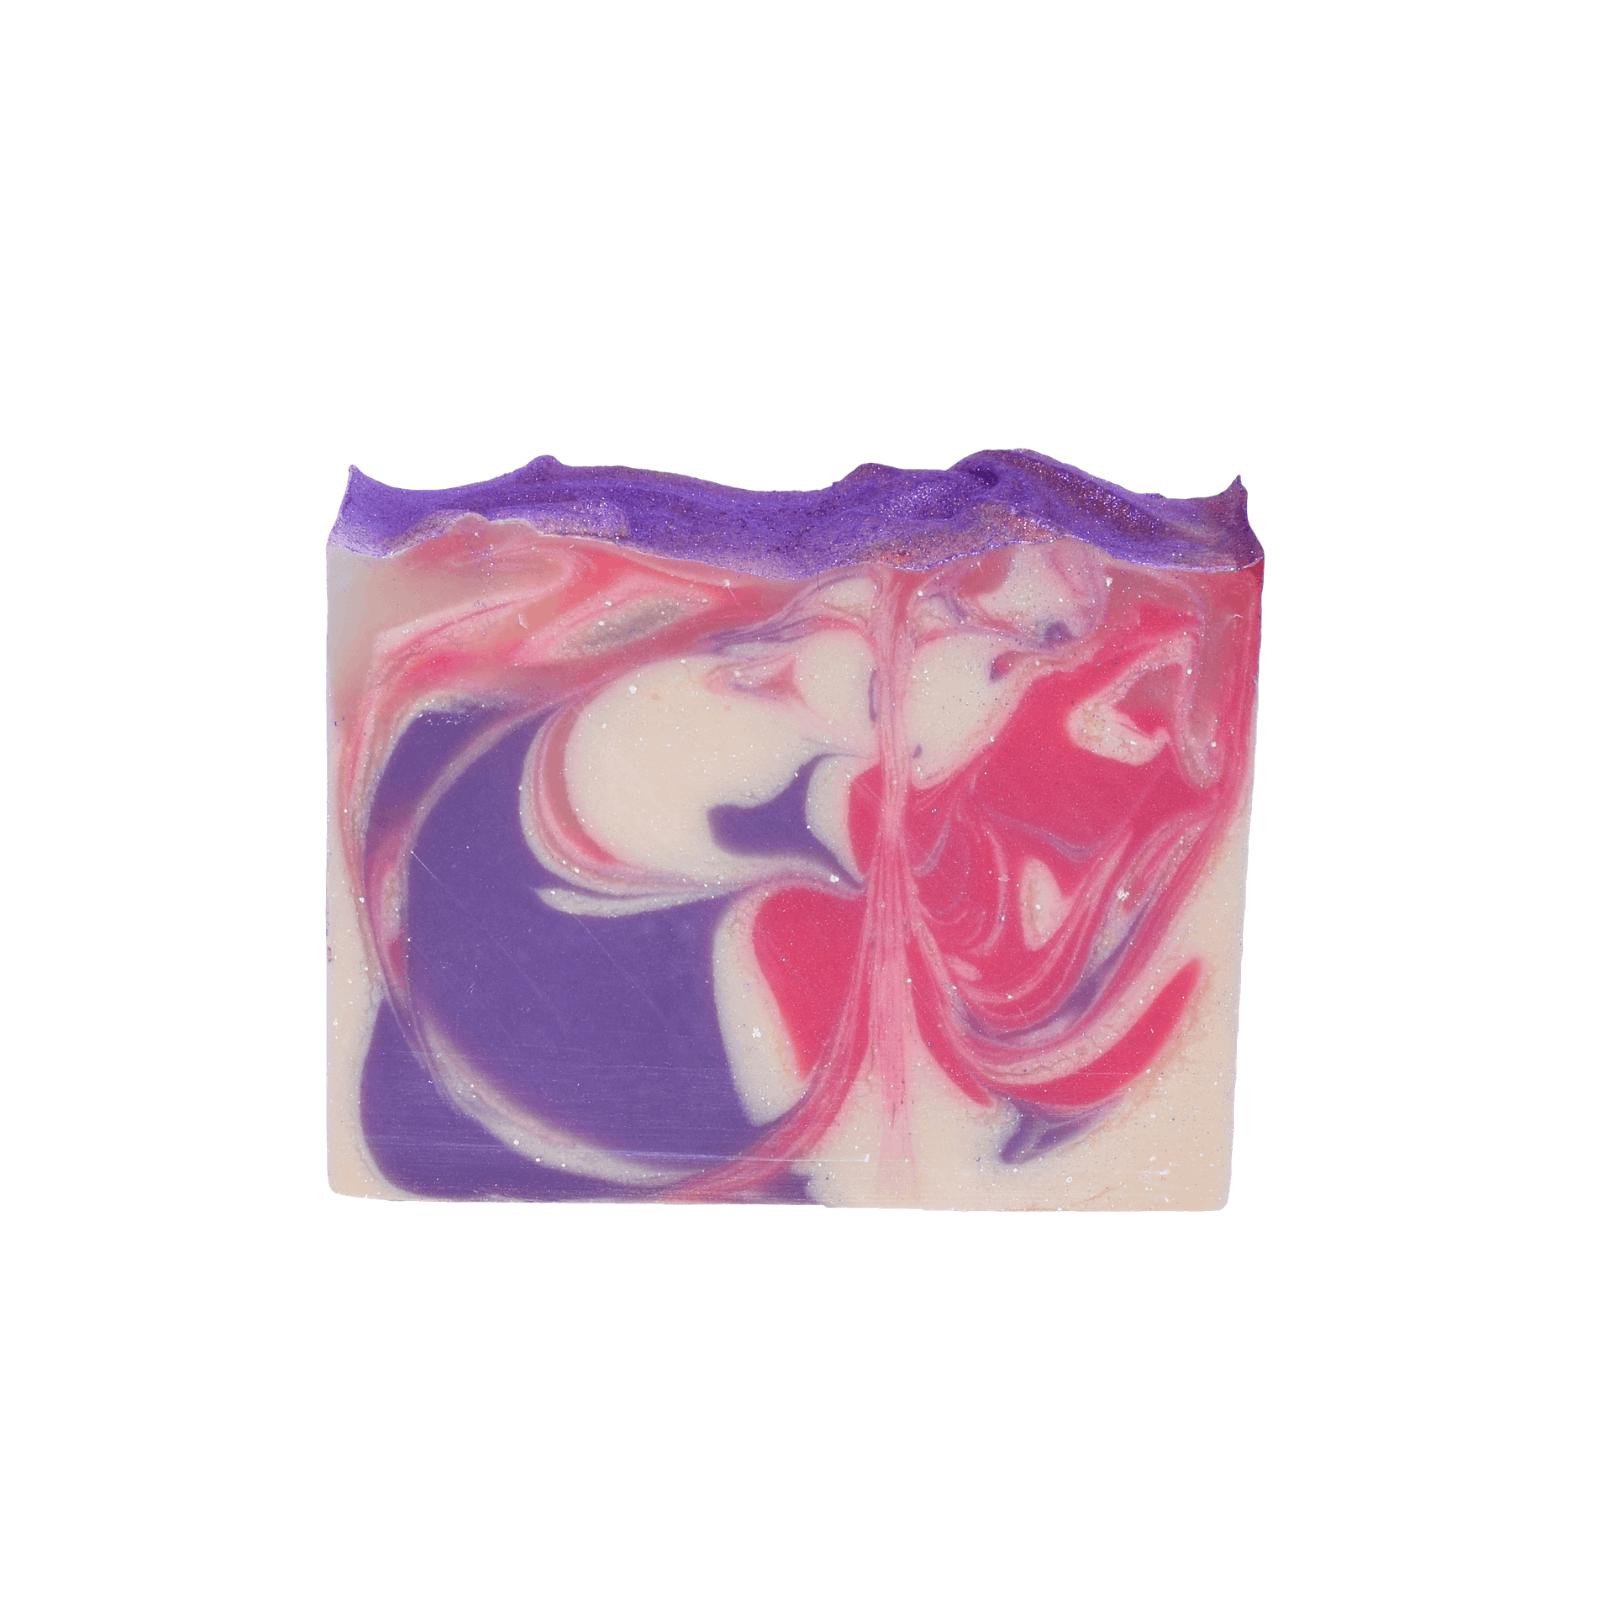 Huckleberry Soap